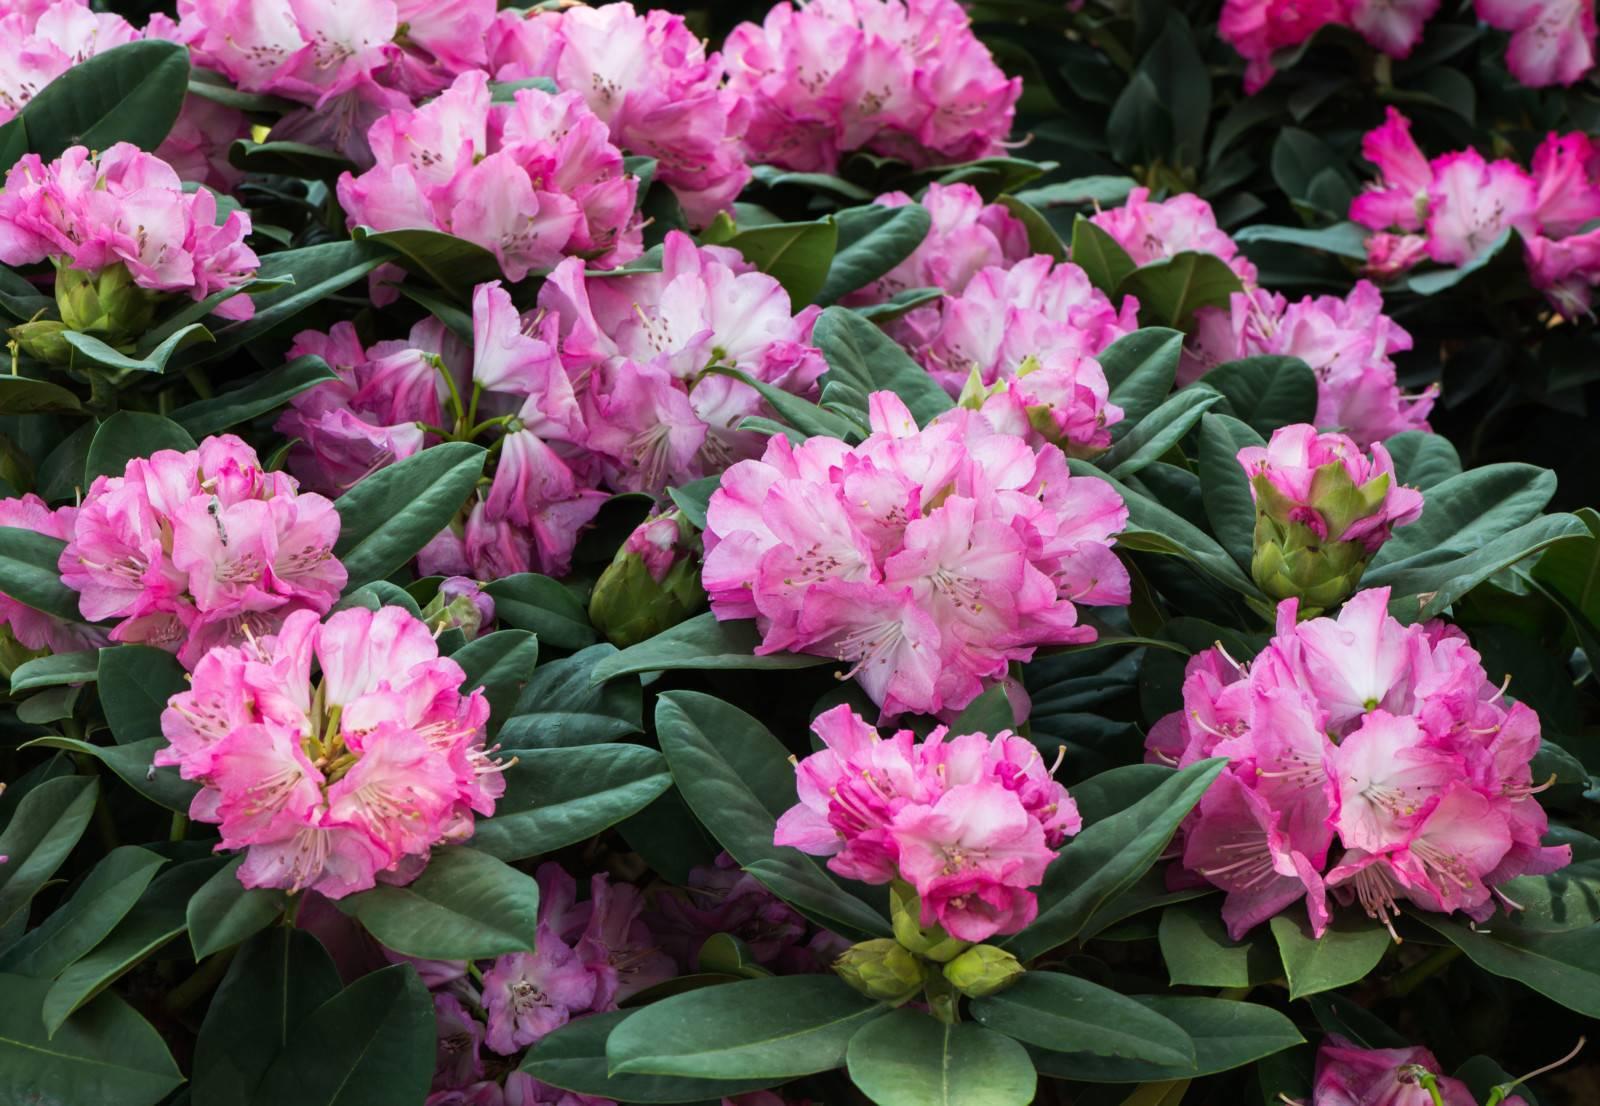 Рододендрон: посадка и уход, выращивание из семян